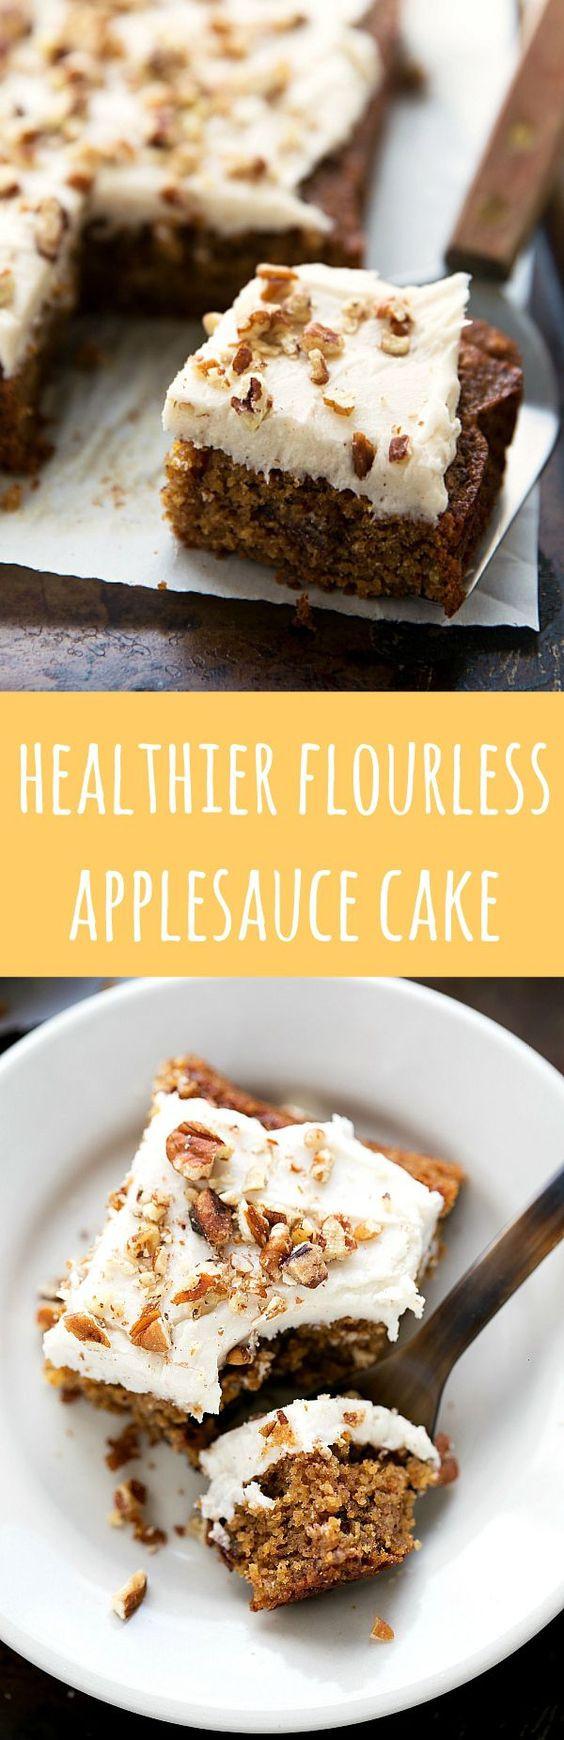 Healthy Applesauce Cake Recipe  Healthy Flourless Applesauce Spice Cake